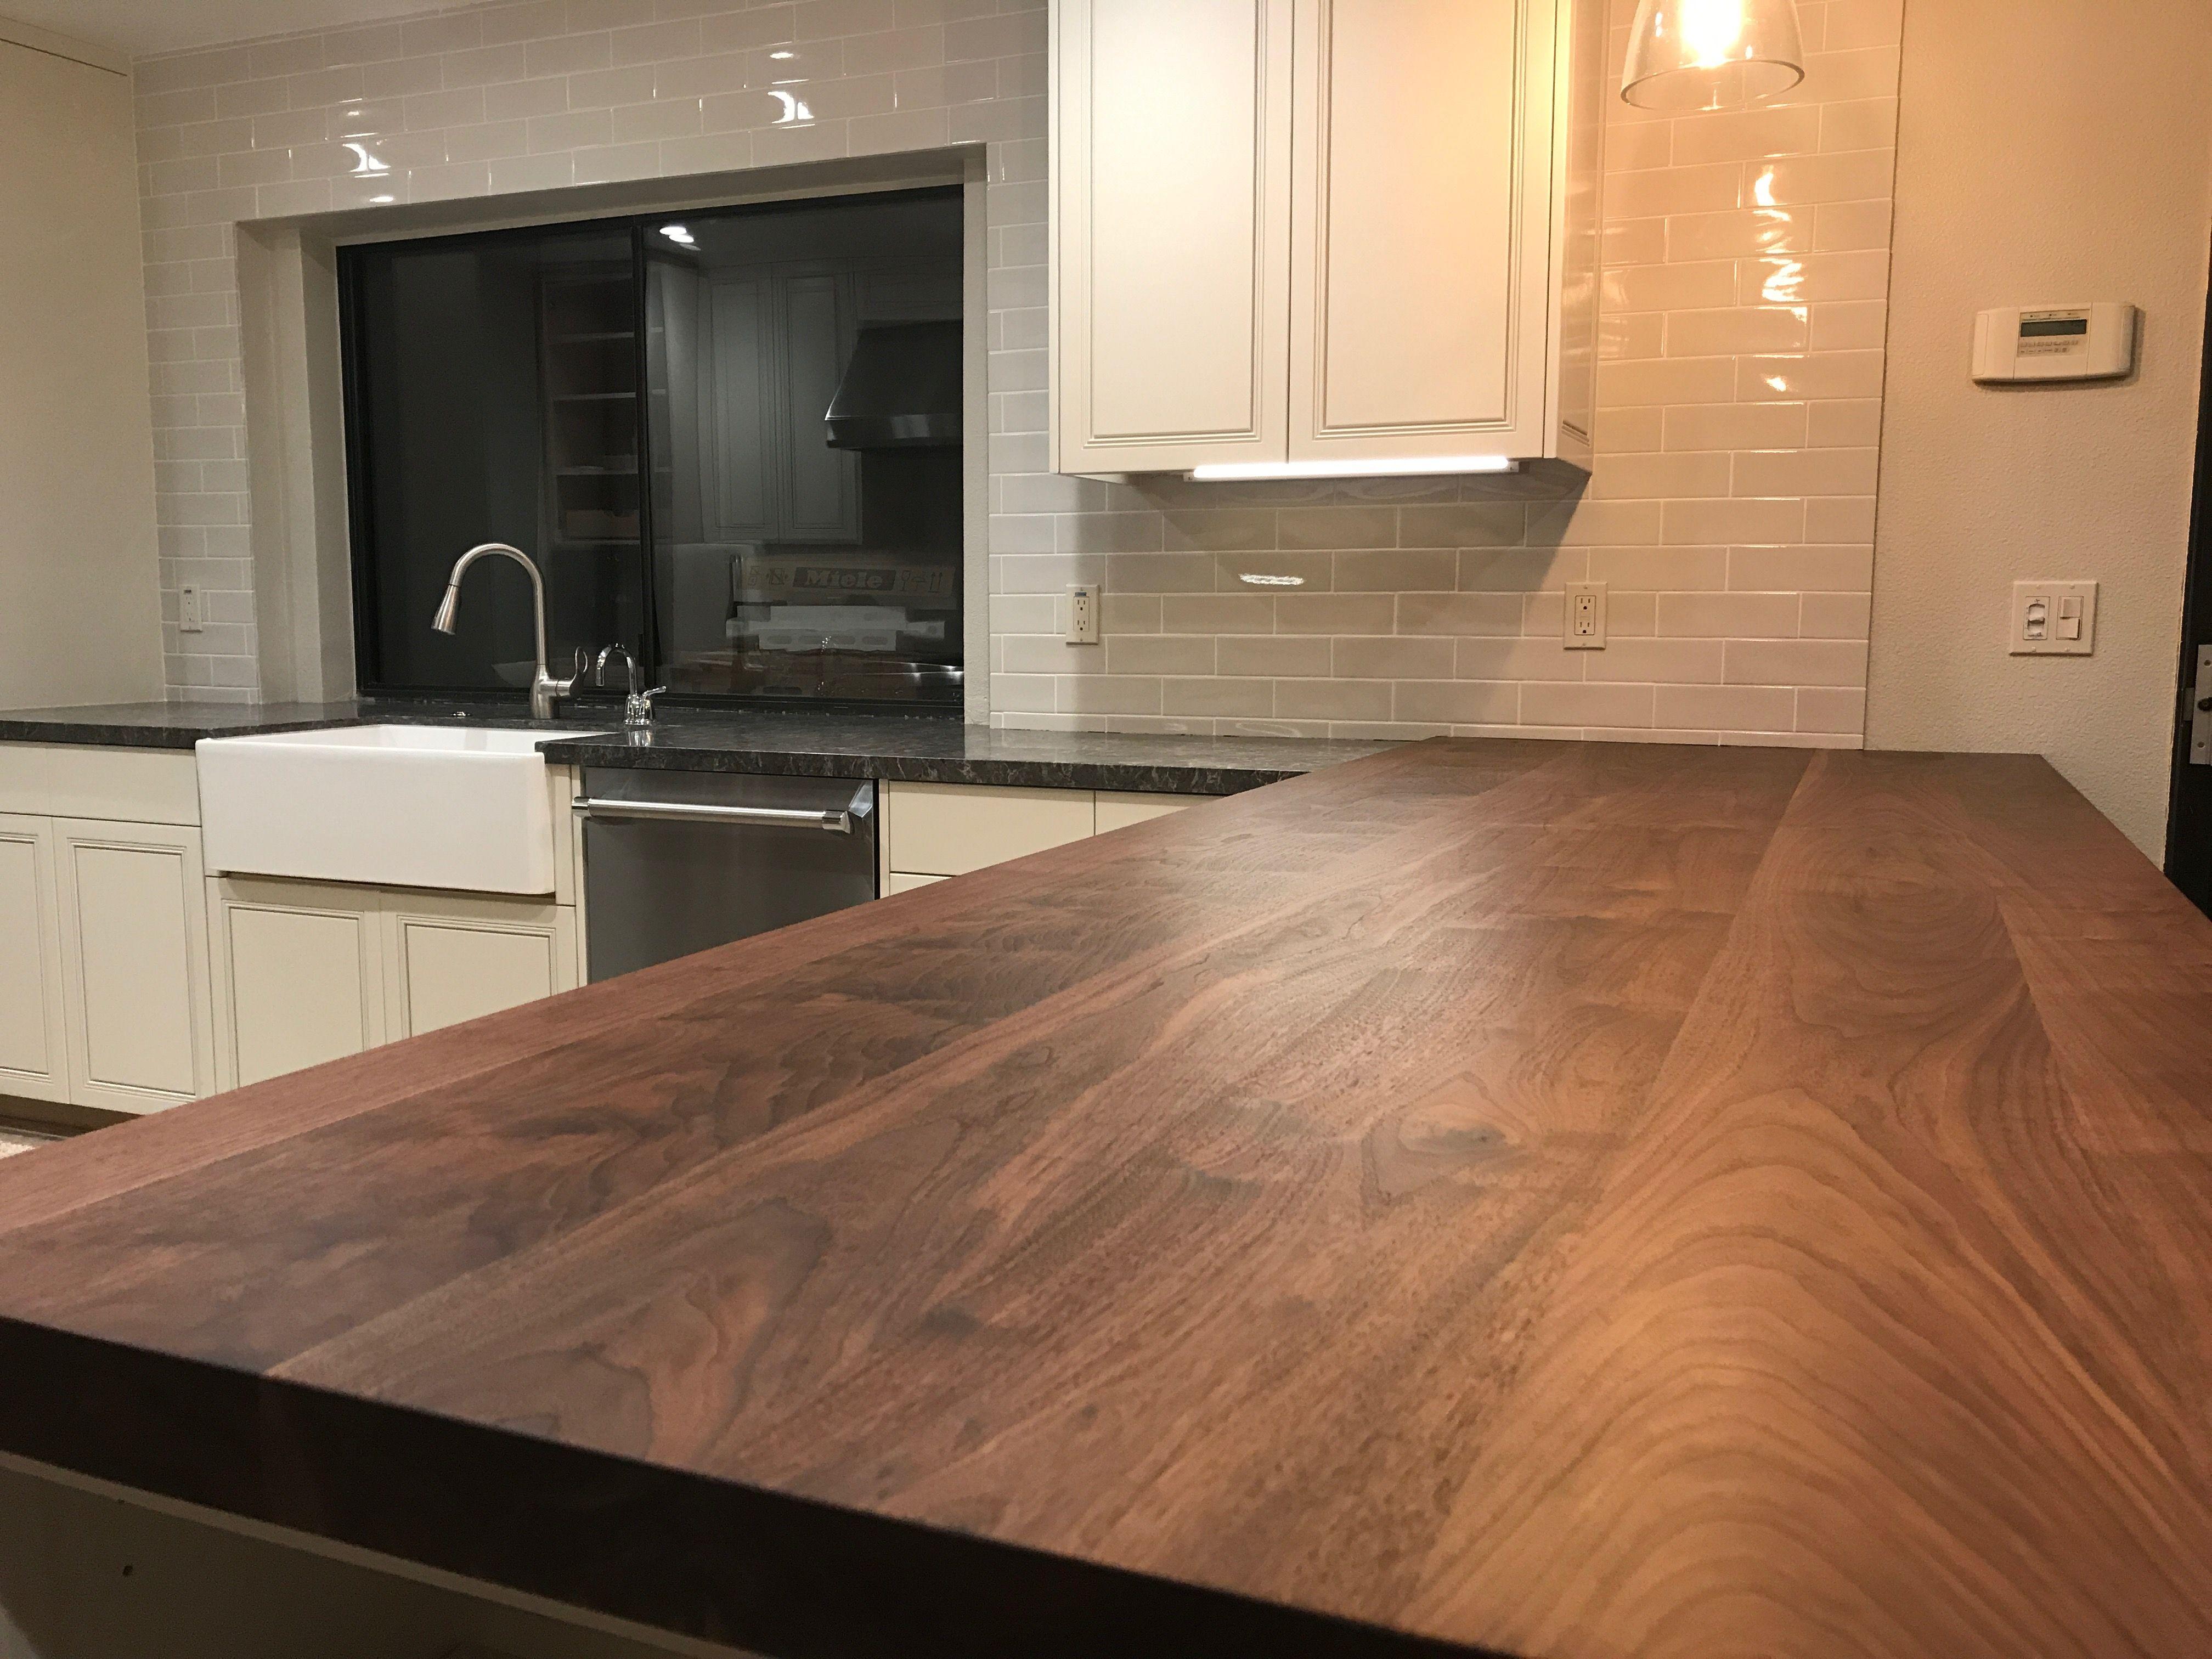 Kitchen Design With Wood Look Porcelain Tile Gray Quartz And